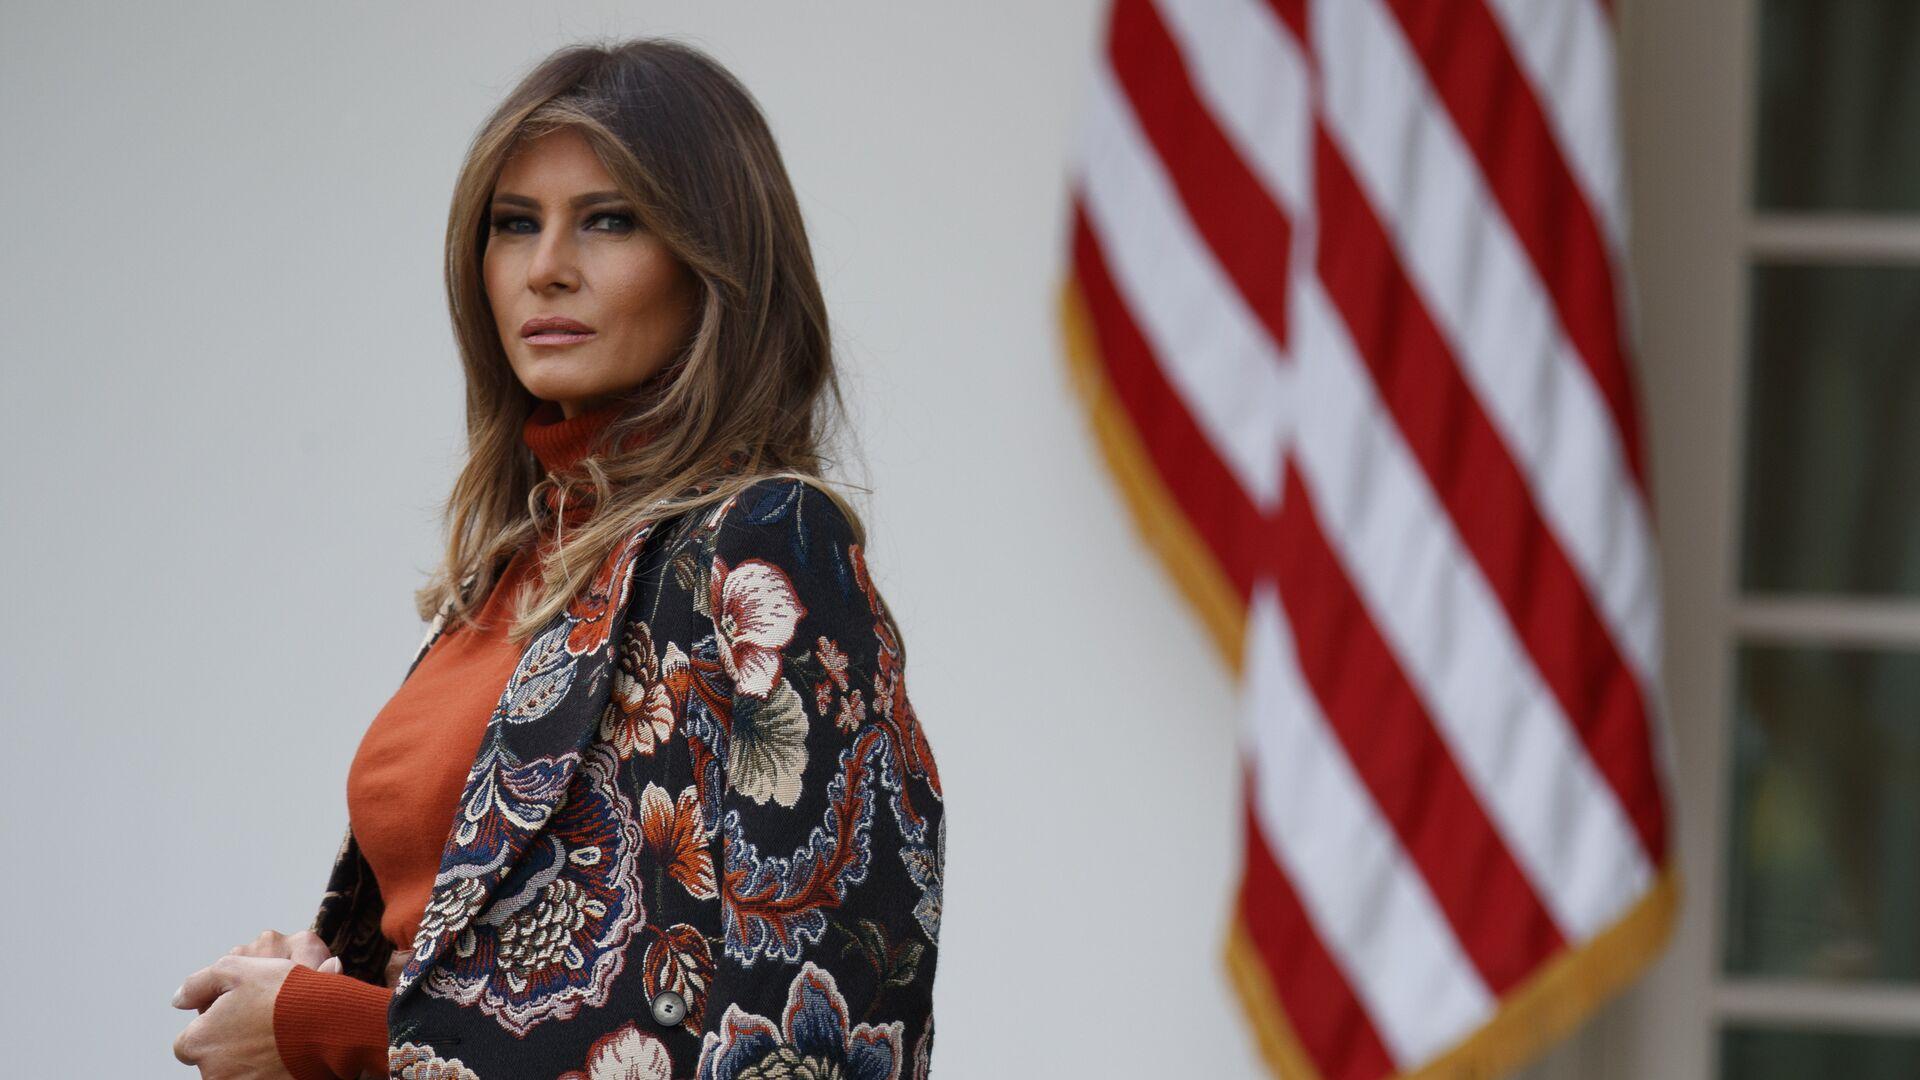 Первая леди Меланья Трамп в Розовом саду Белого дома - РИА Новости, 1920, 11.01.2021